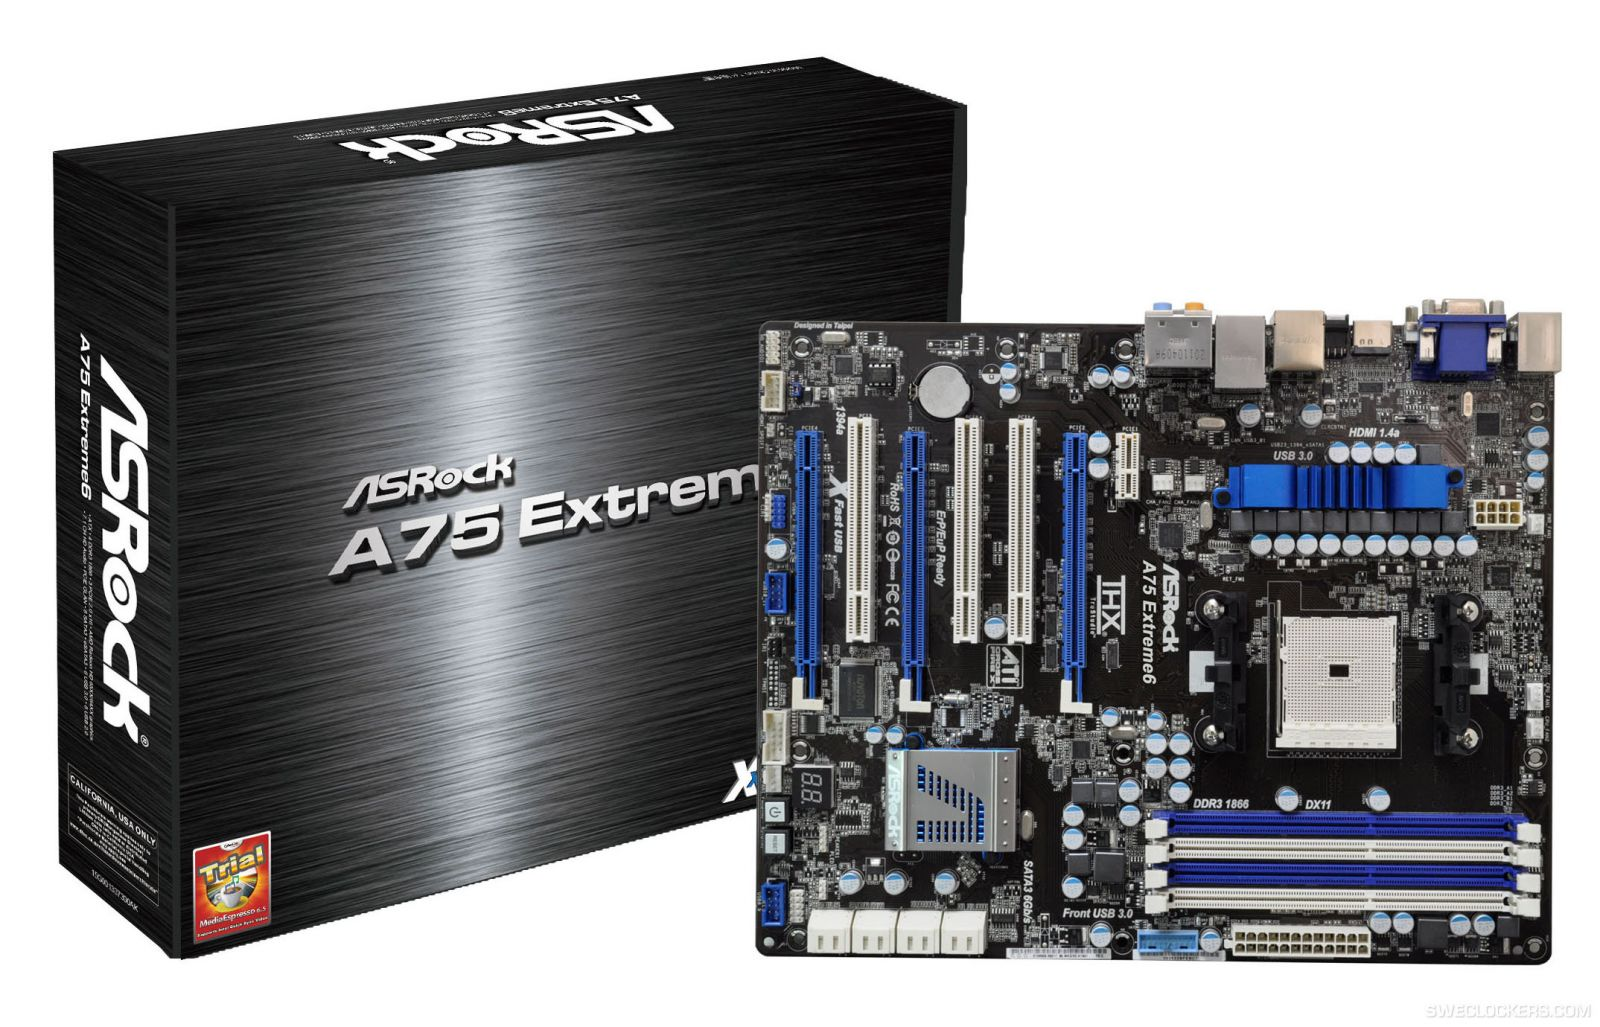 ASROCK A75 EXTREME6 AMD FUSION 64 BIT DRIVER